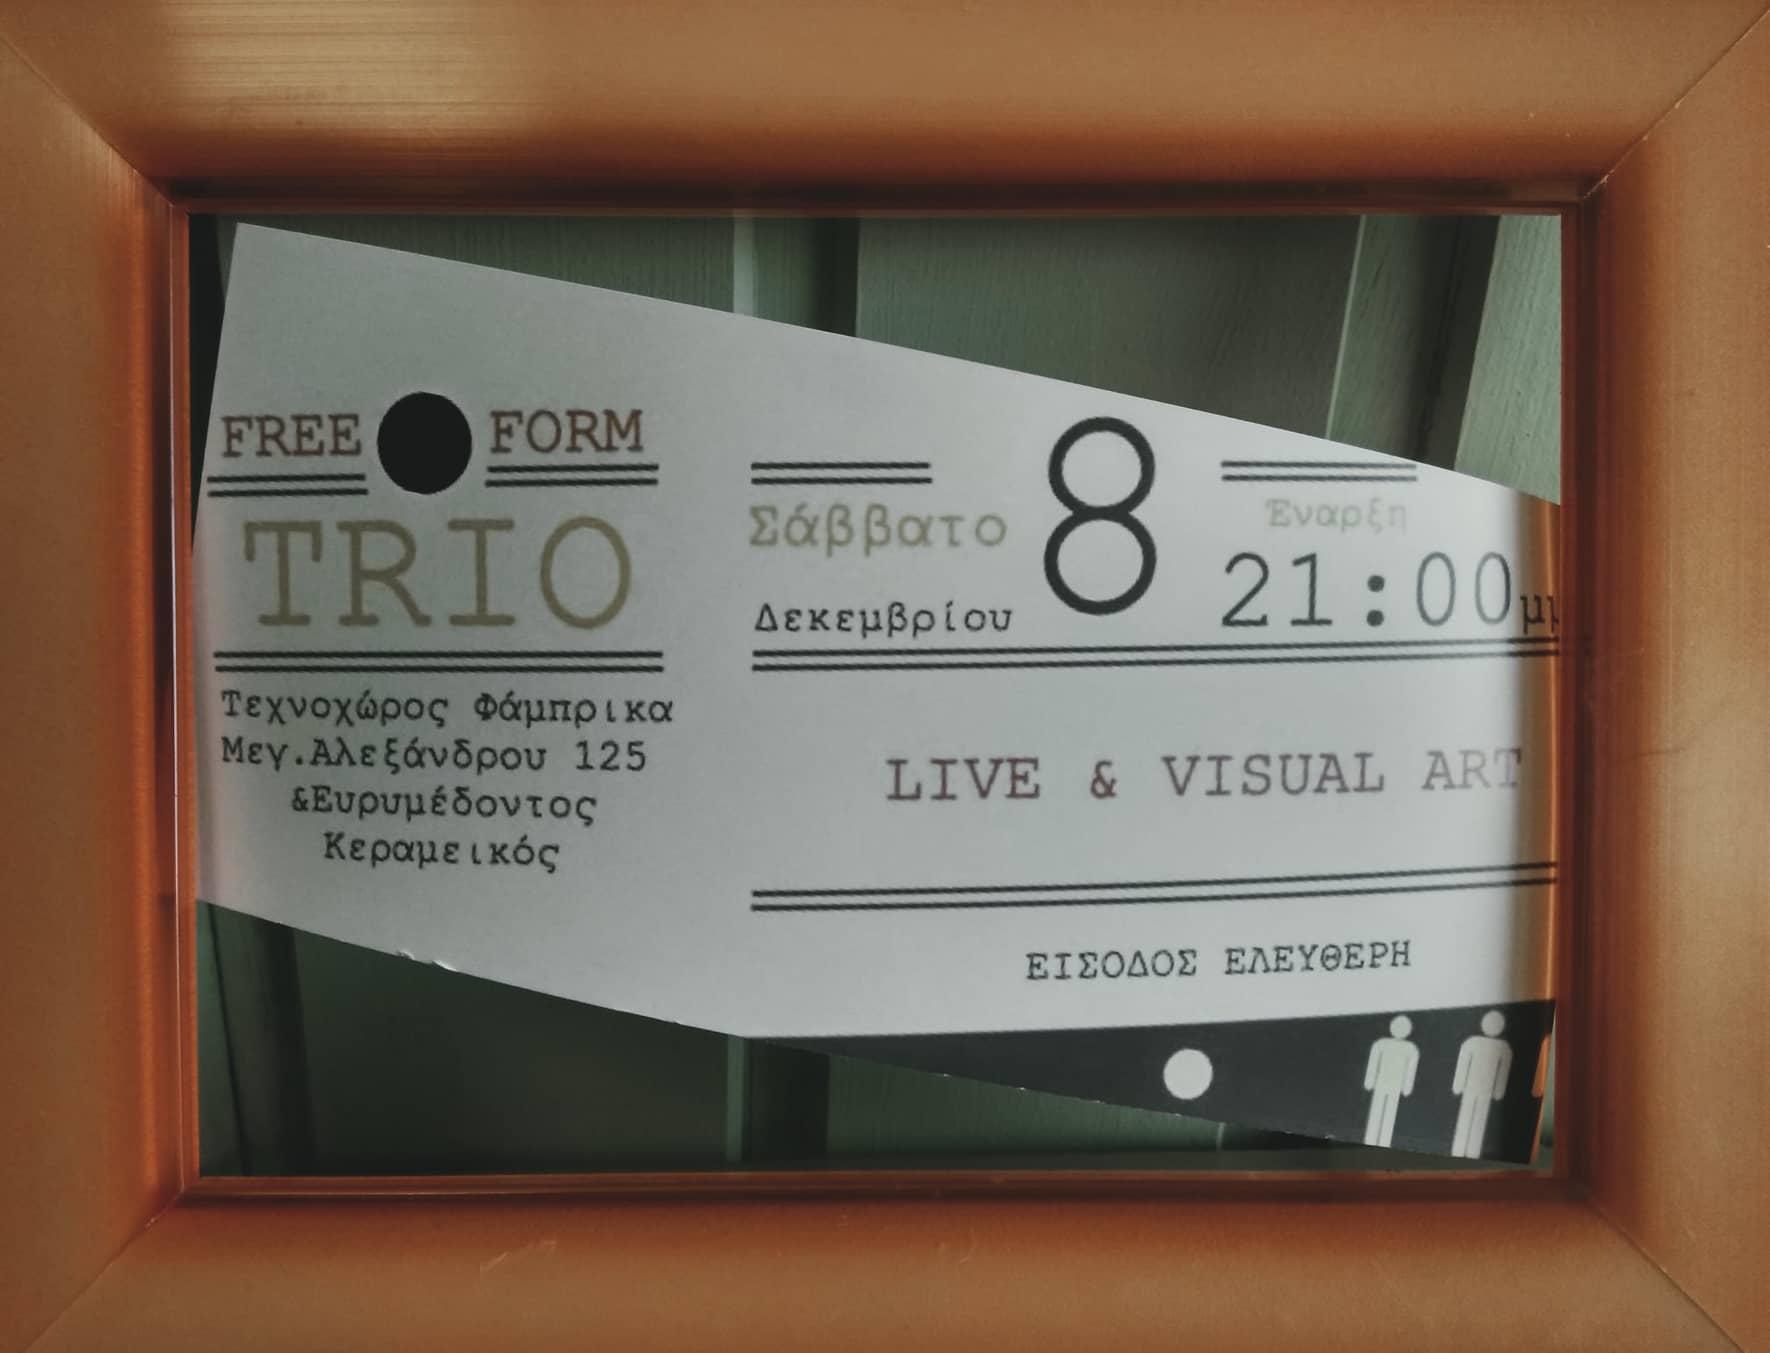 Free Form Trio, fabrica athens, live music, visual art, theater, athens, τεχνοχώρος φάμπρικα, ζωντανή μουσική, θέατρα, αθήνα κεραμεικός